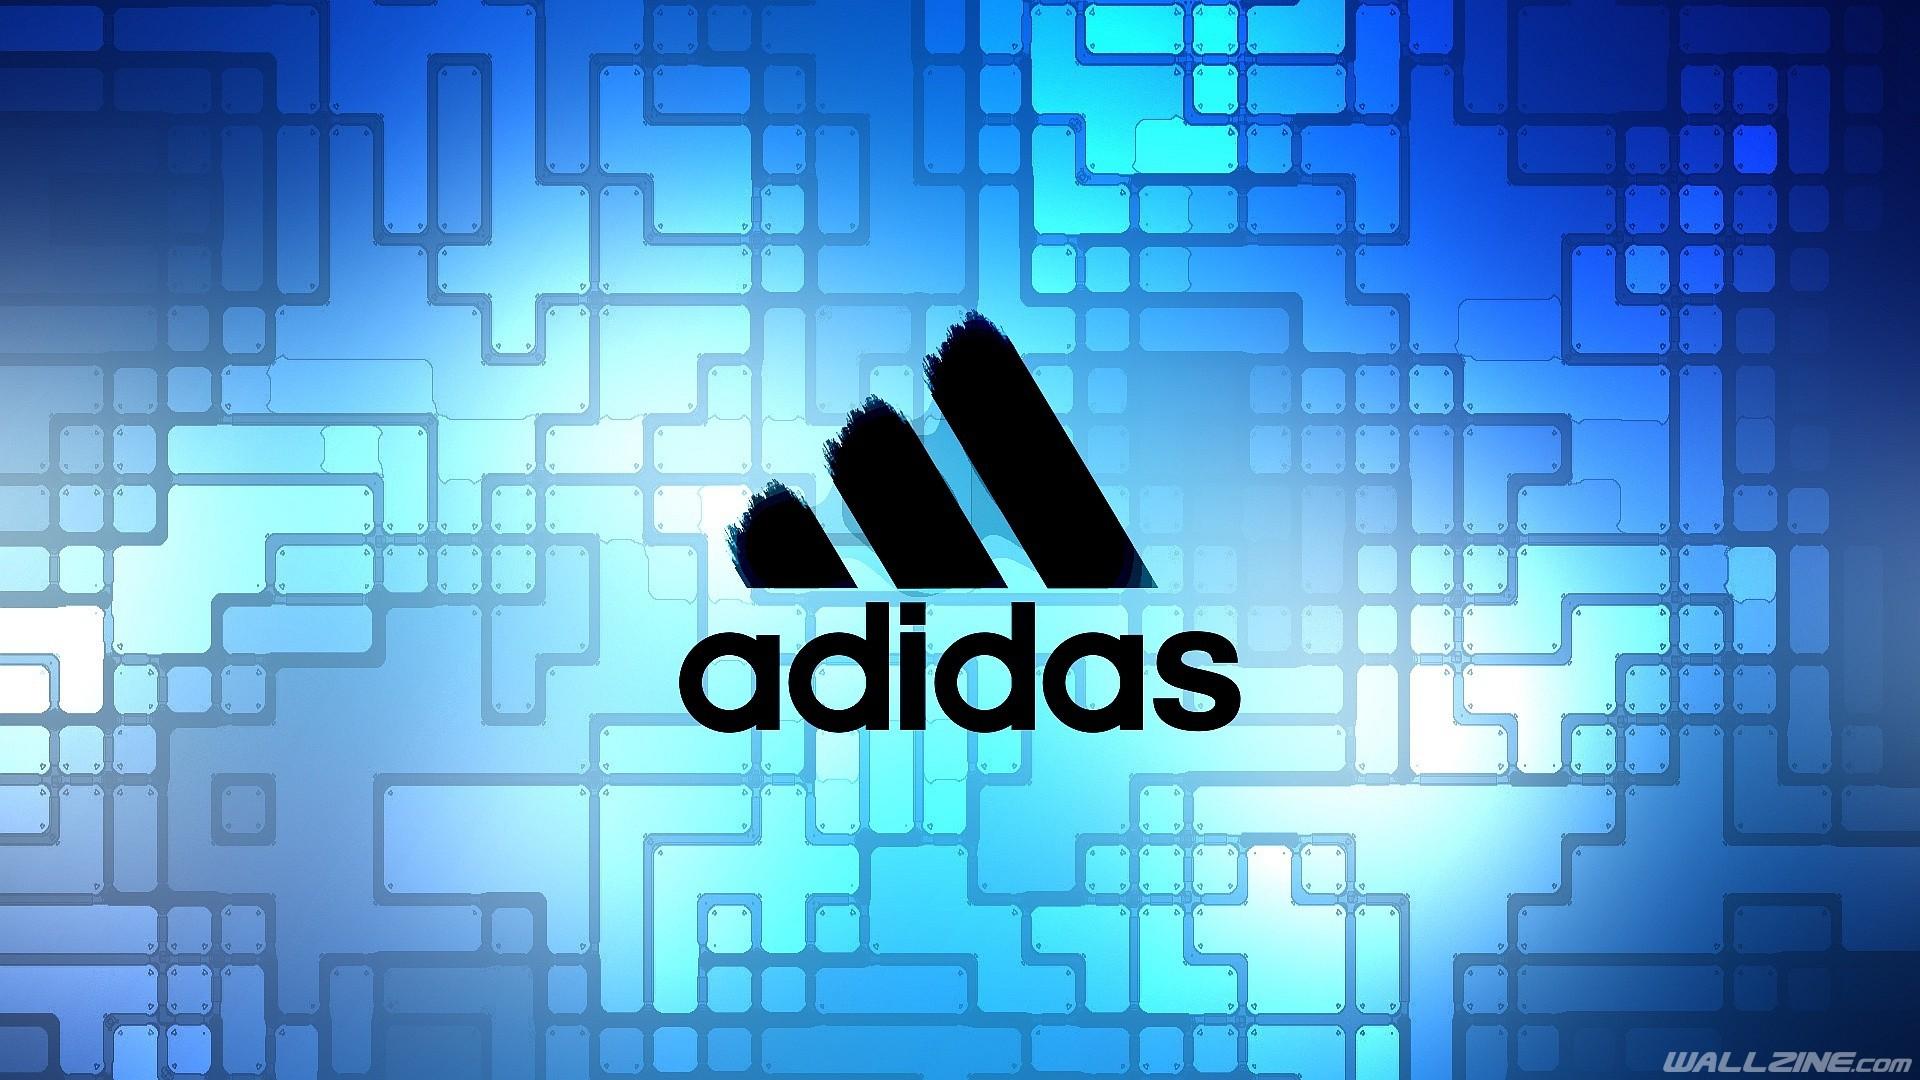 Adidas Logo Wallpaper 2018 71 Images